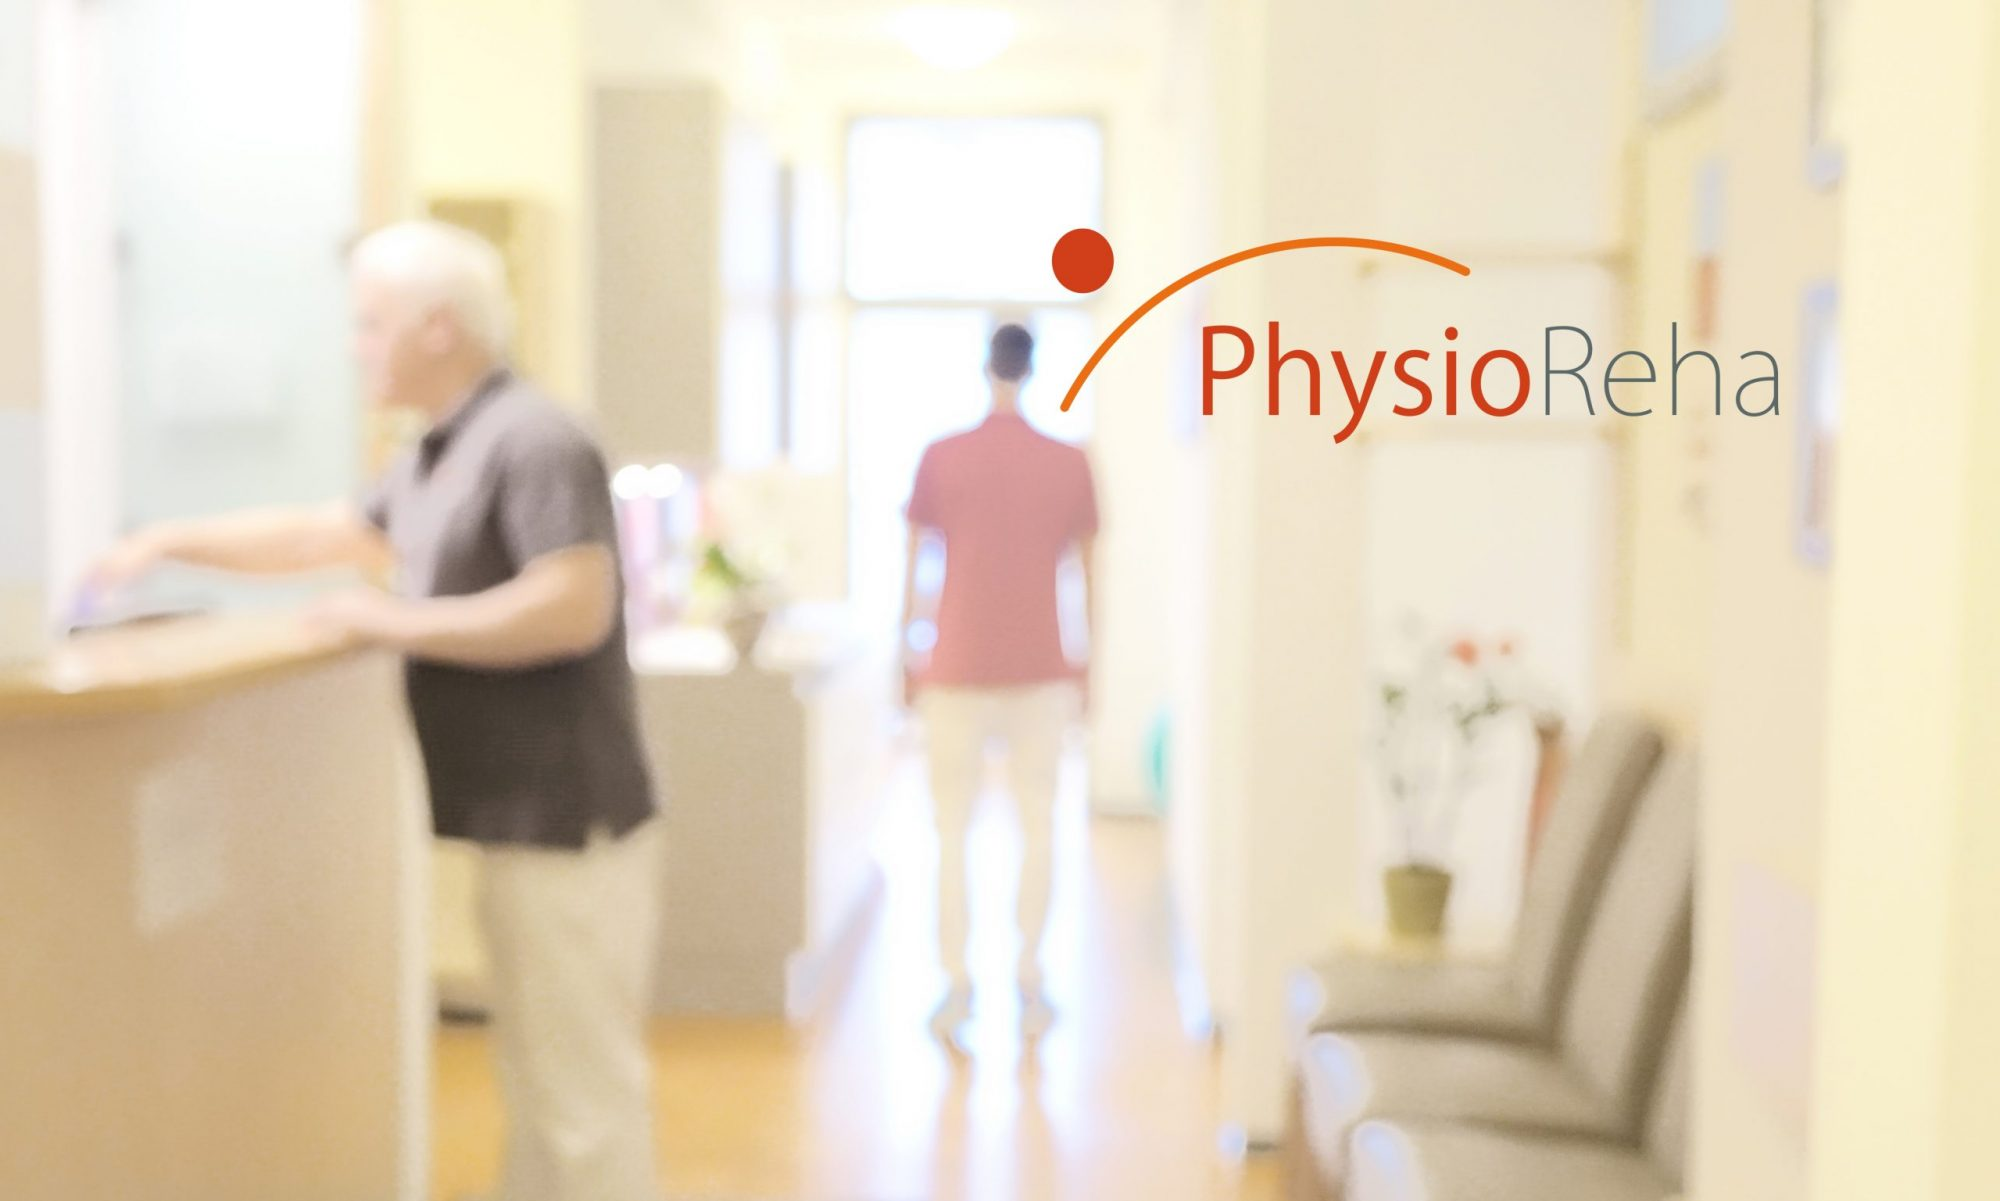 PhysioReha